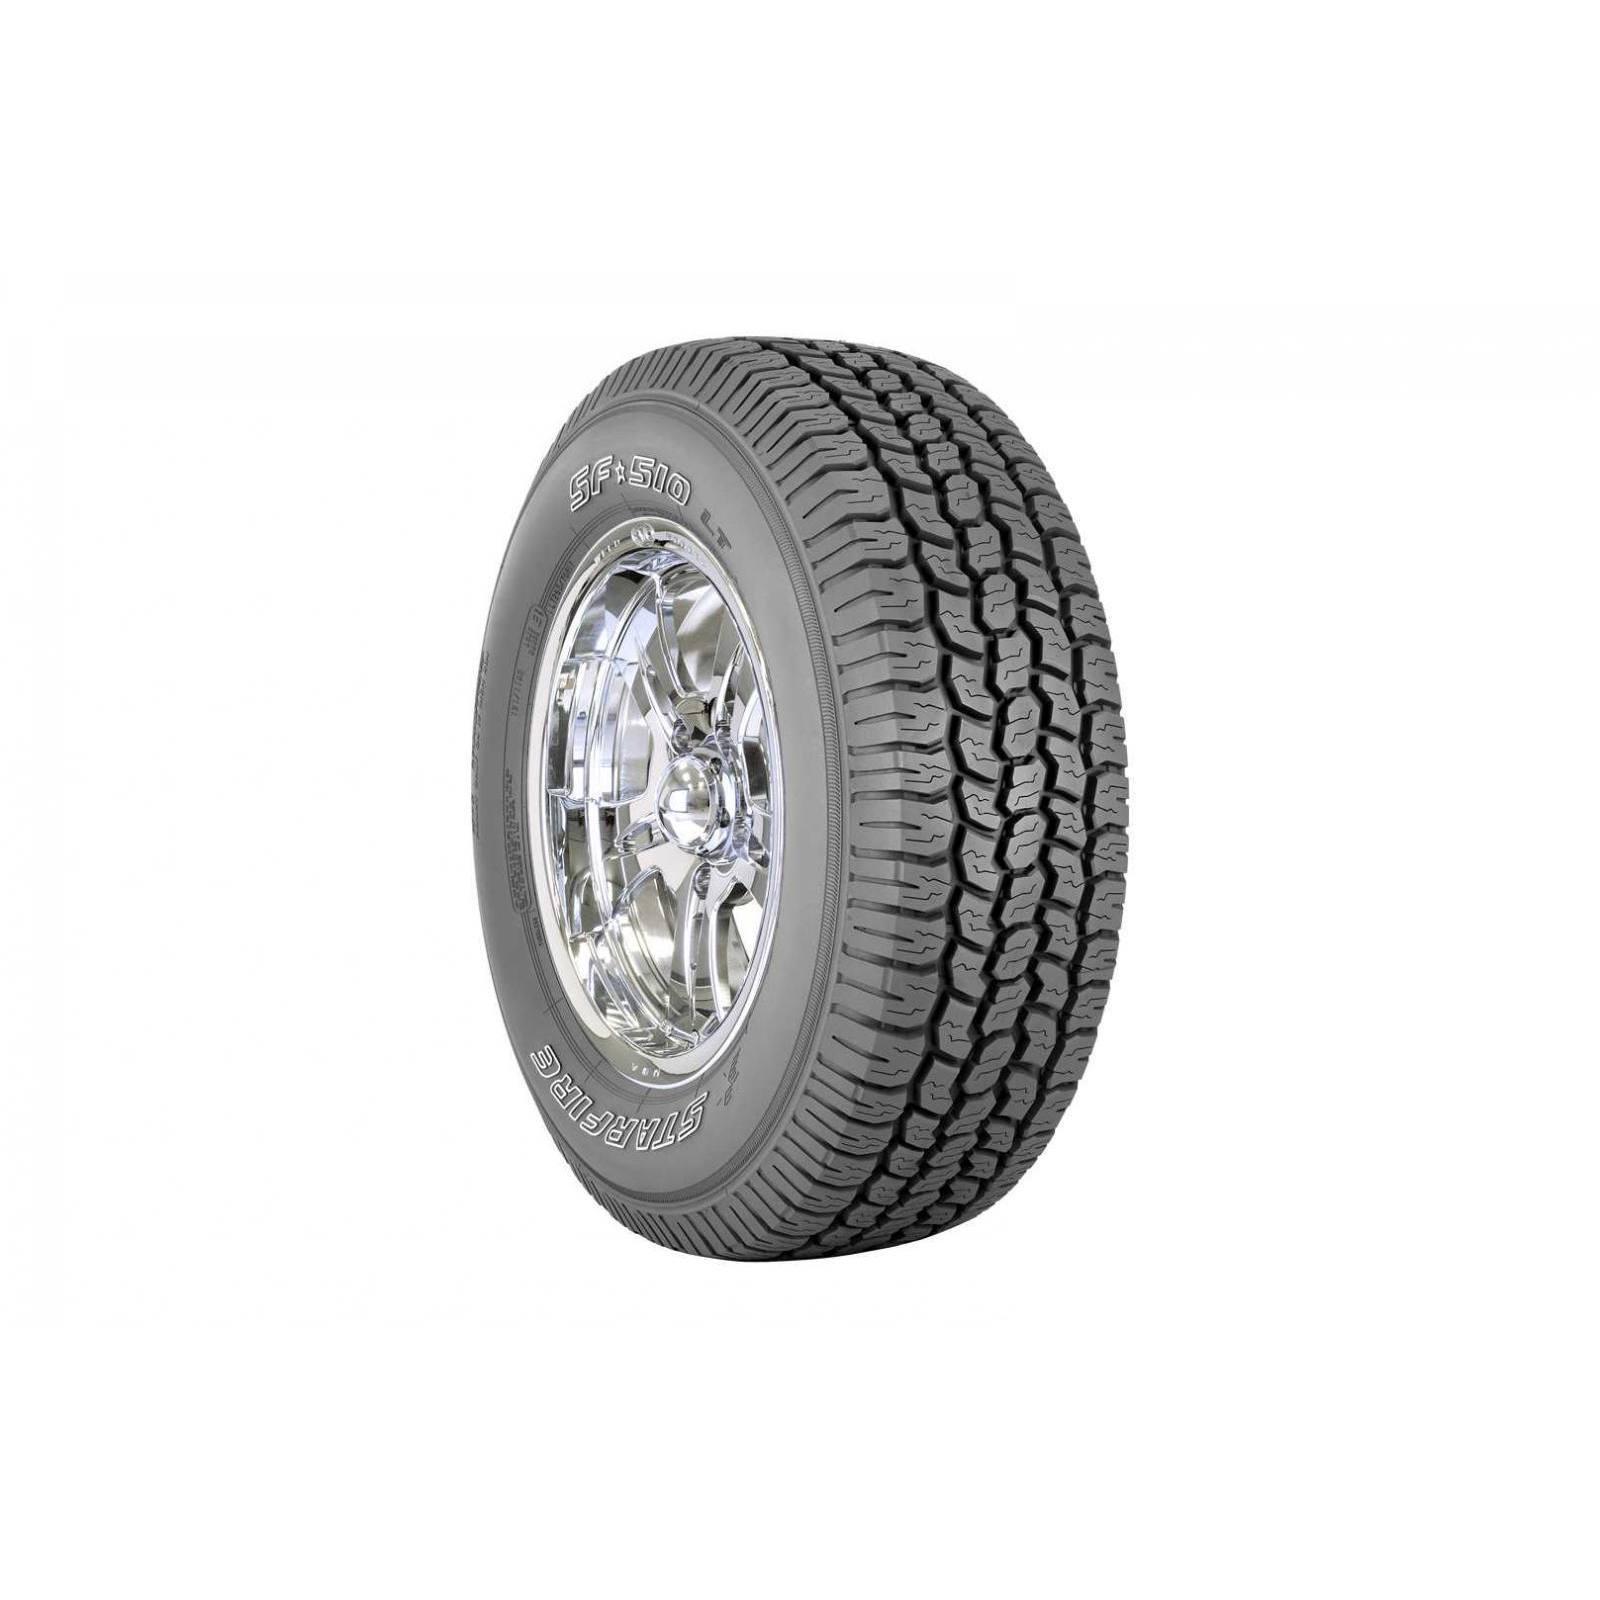 Starfire SF-510 All Season Tire - 235/70R16 106S (Black)